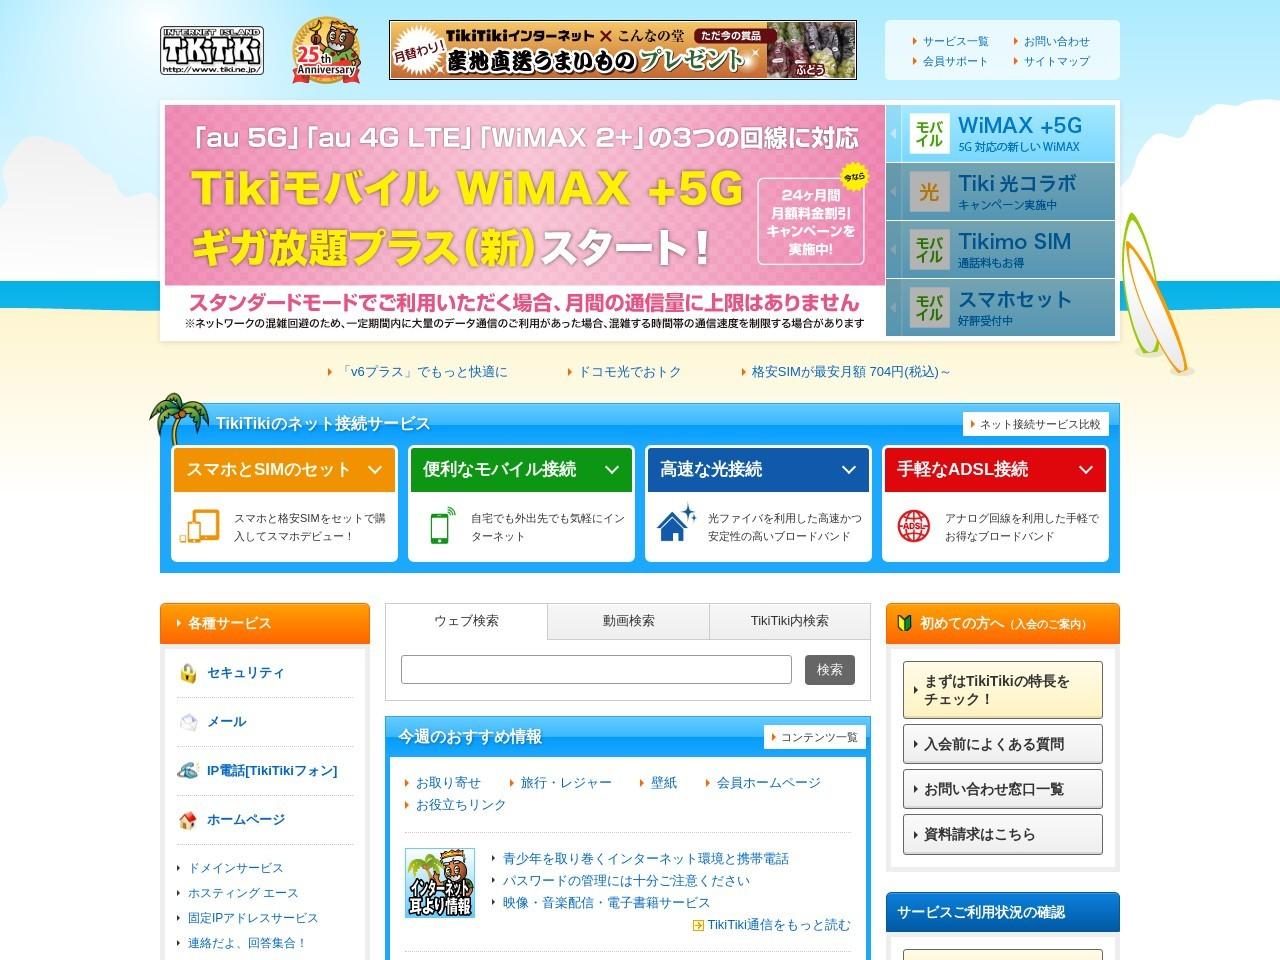 http://ww3.tiki.ne.jp/~myrte/week.html